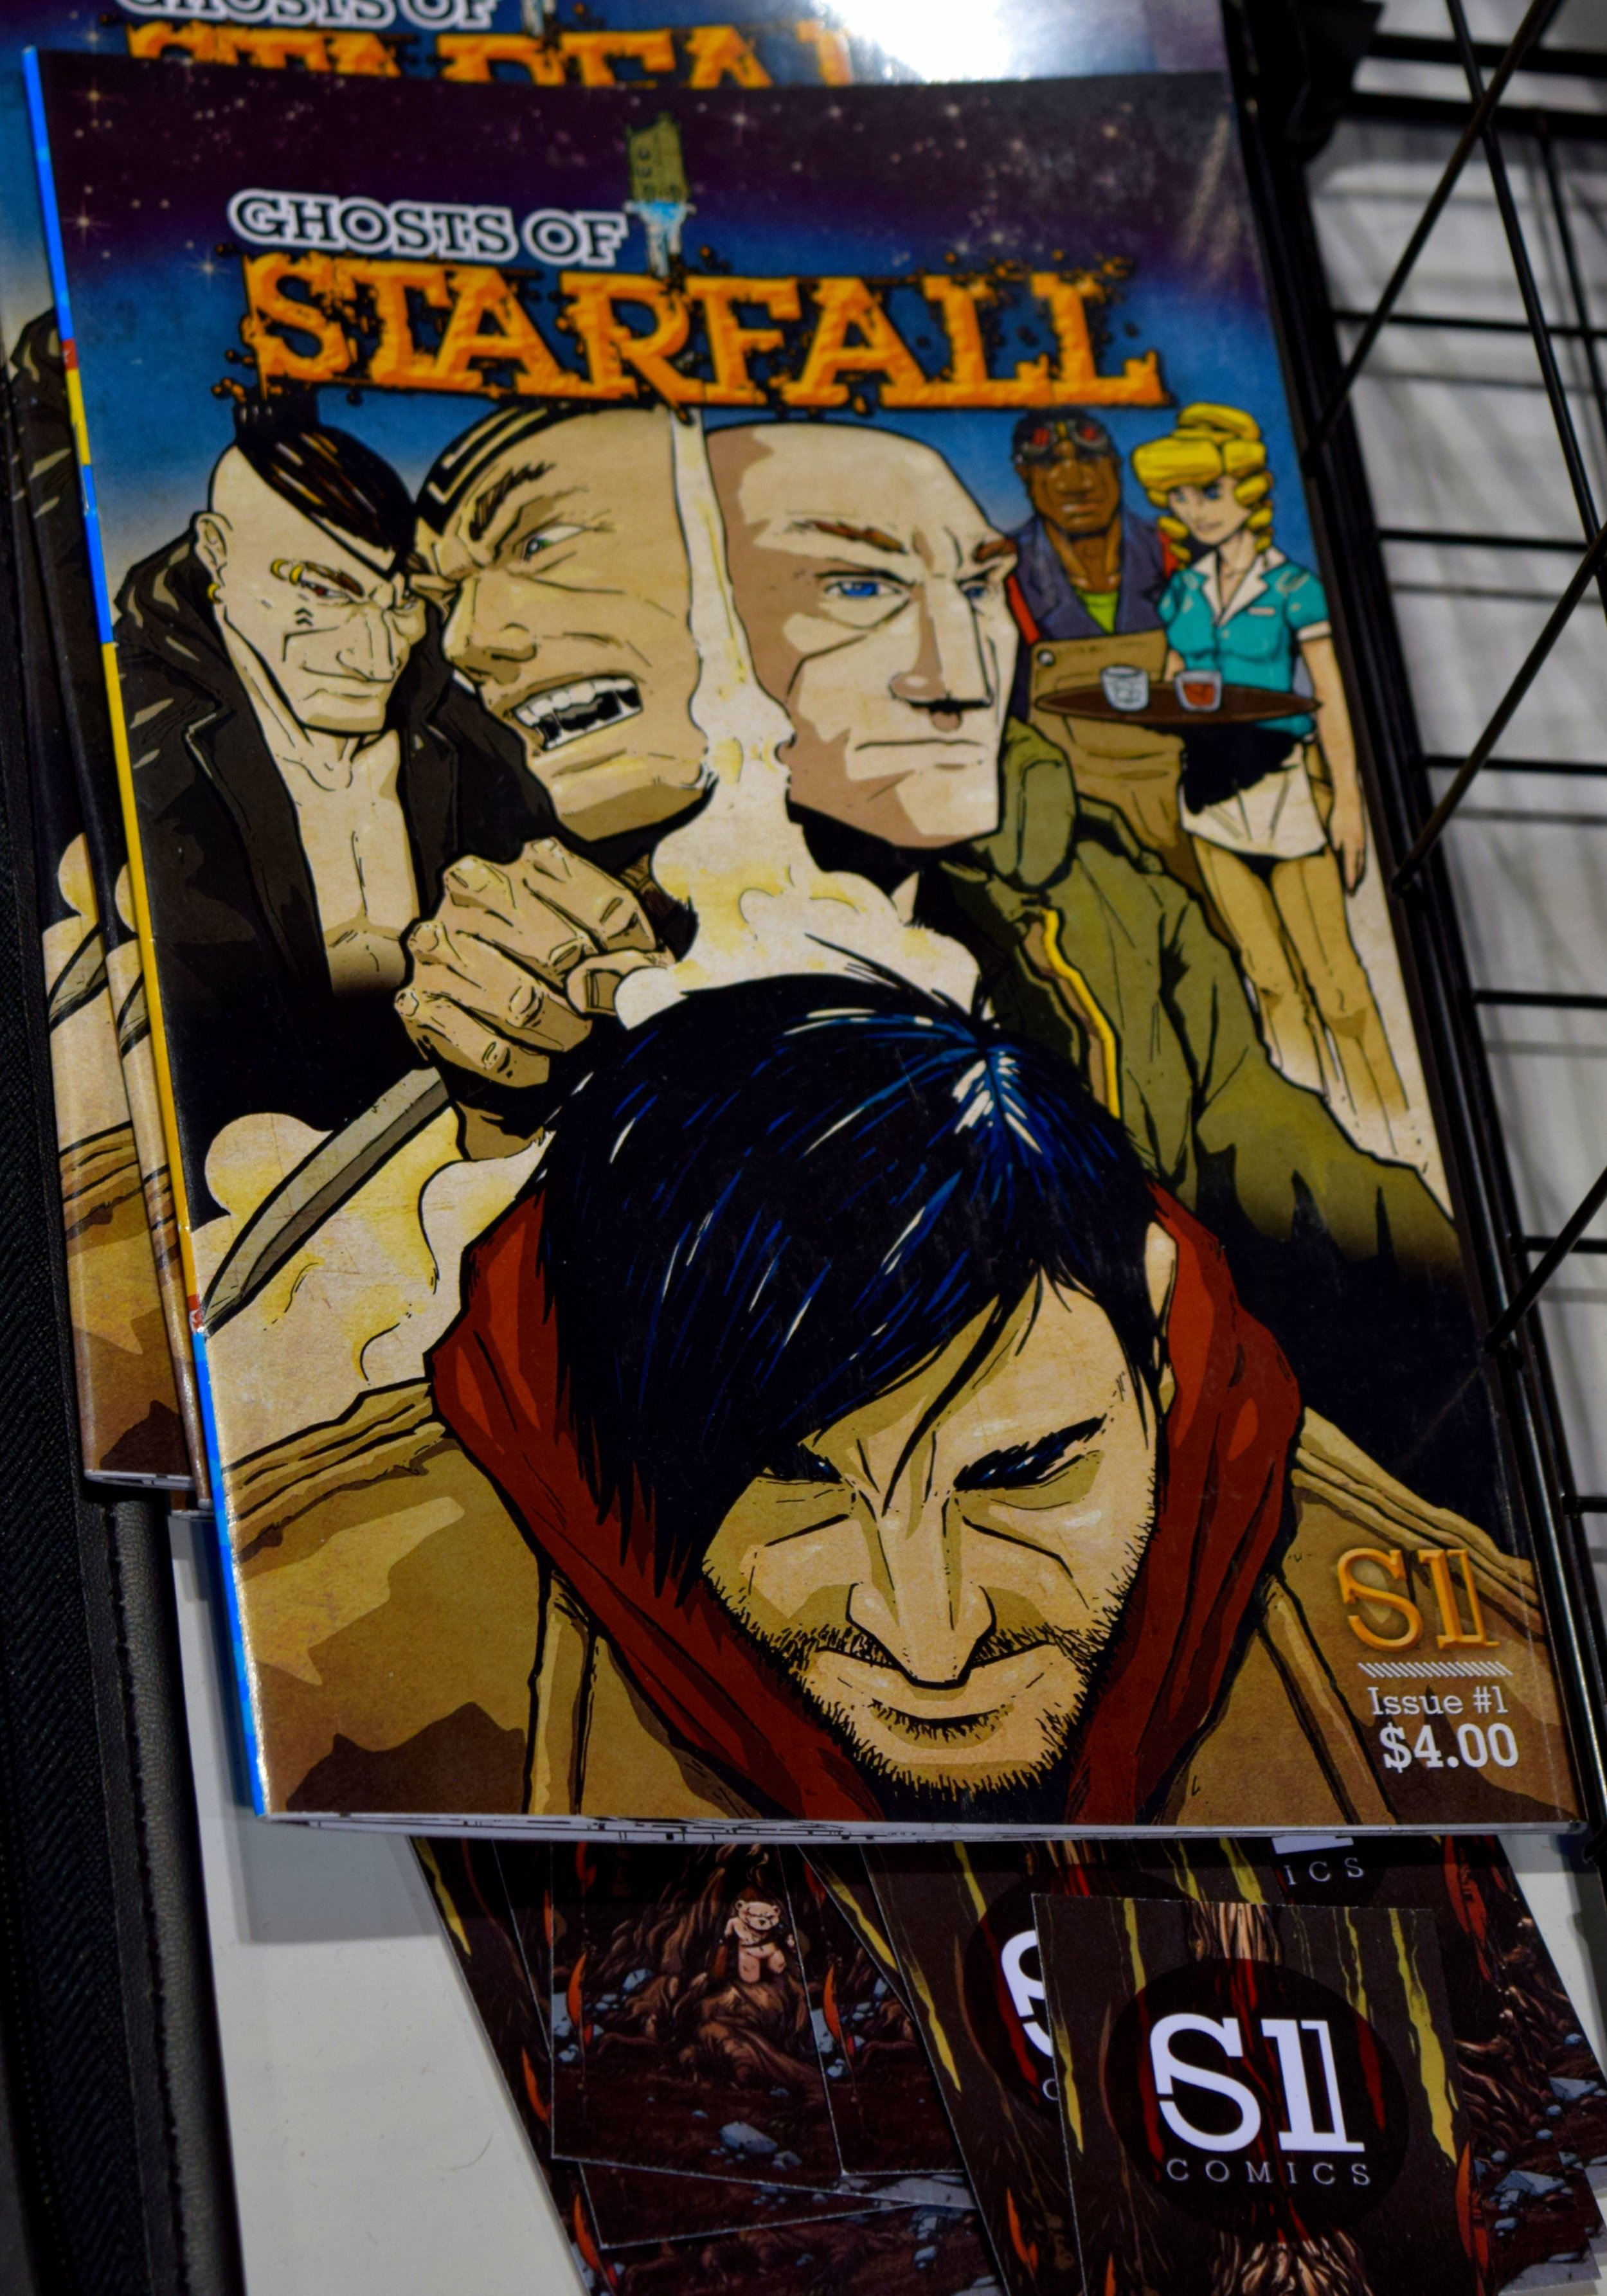 Ghosts of Starfall #1 by Adam Boyle & Ben Mikkelsen.